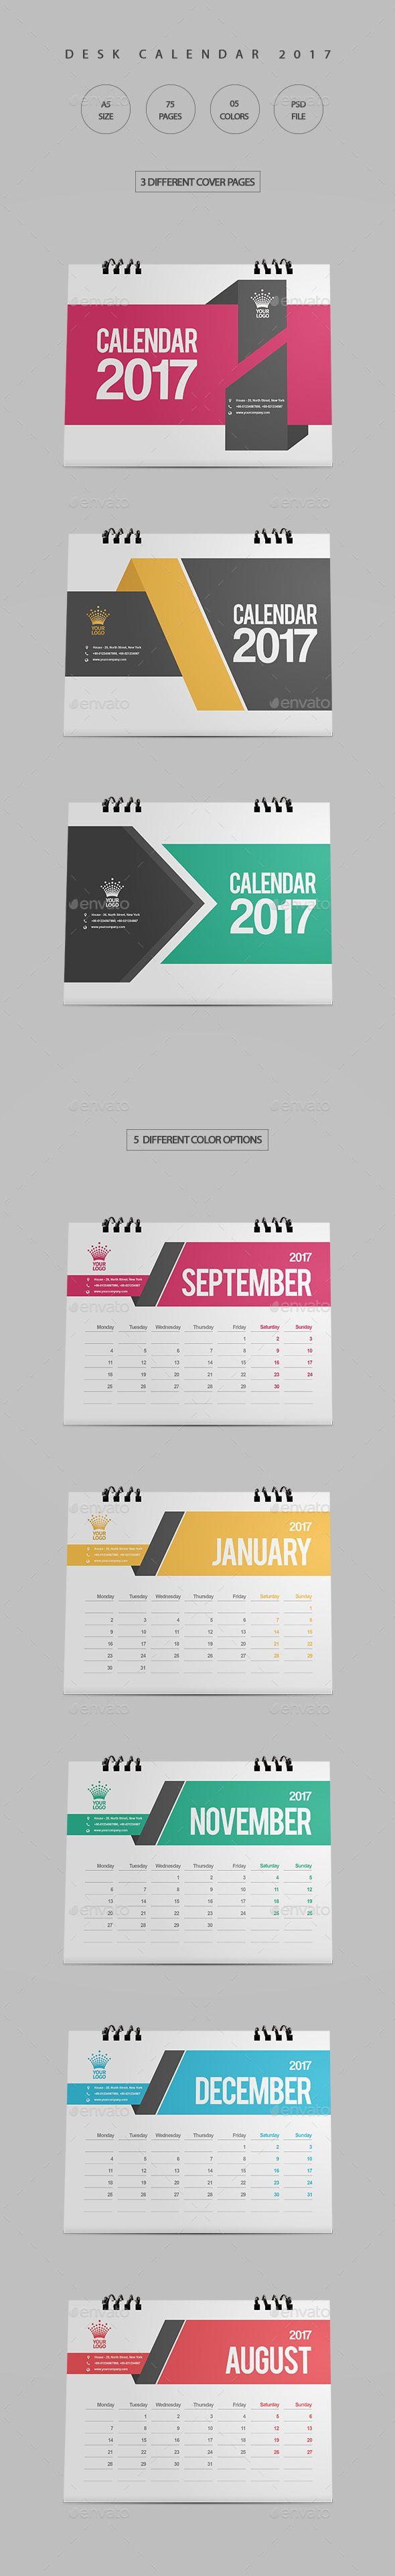 Clean Desk Calendar 2017 — Photoshop PSD #design #calendar • Download ➝ https://graphicriver.net/item/clean-desk-calendar-2017/18807129?ref=pxcr